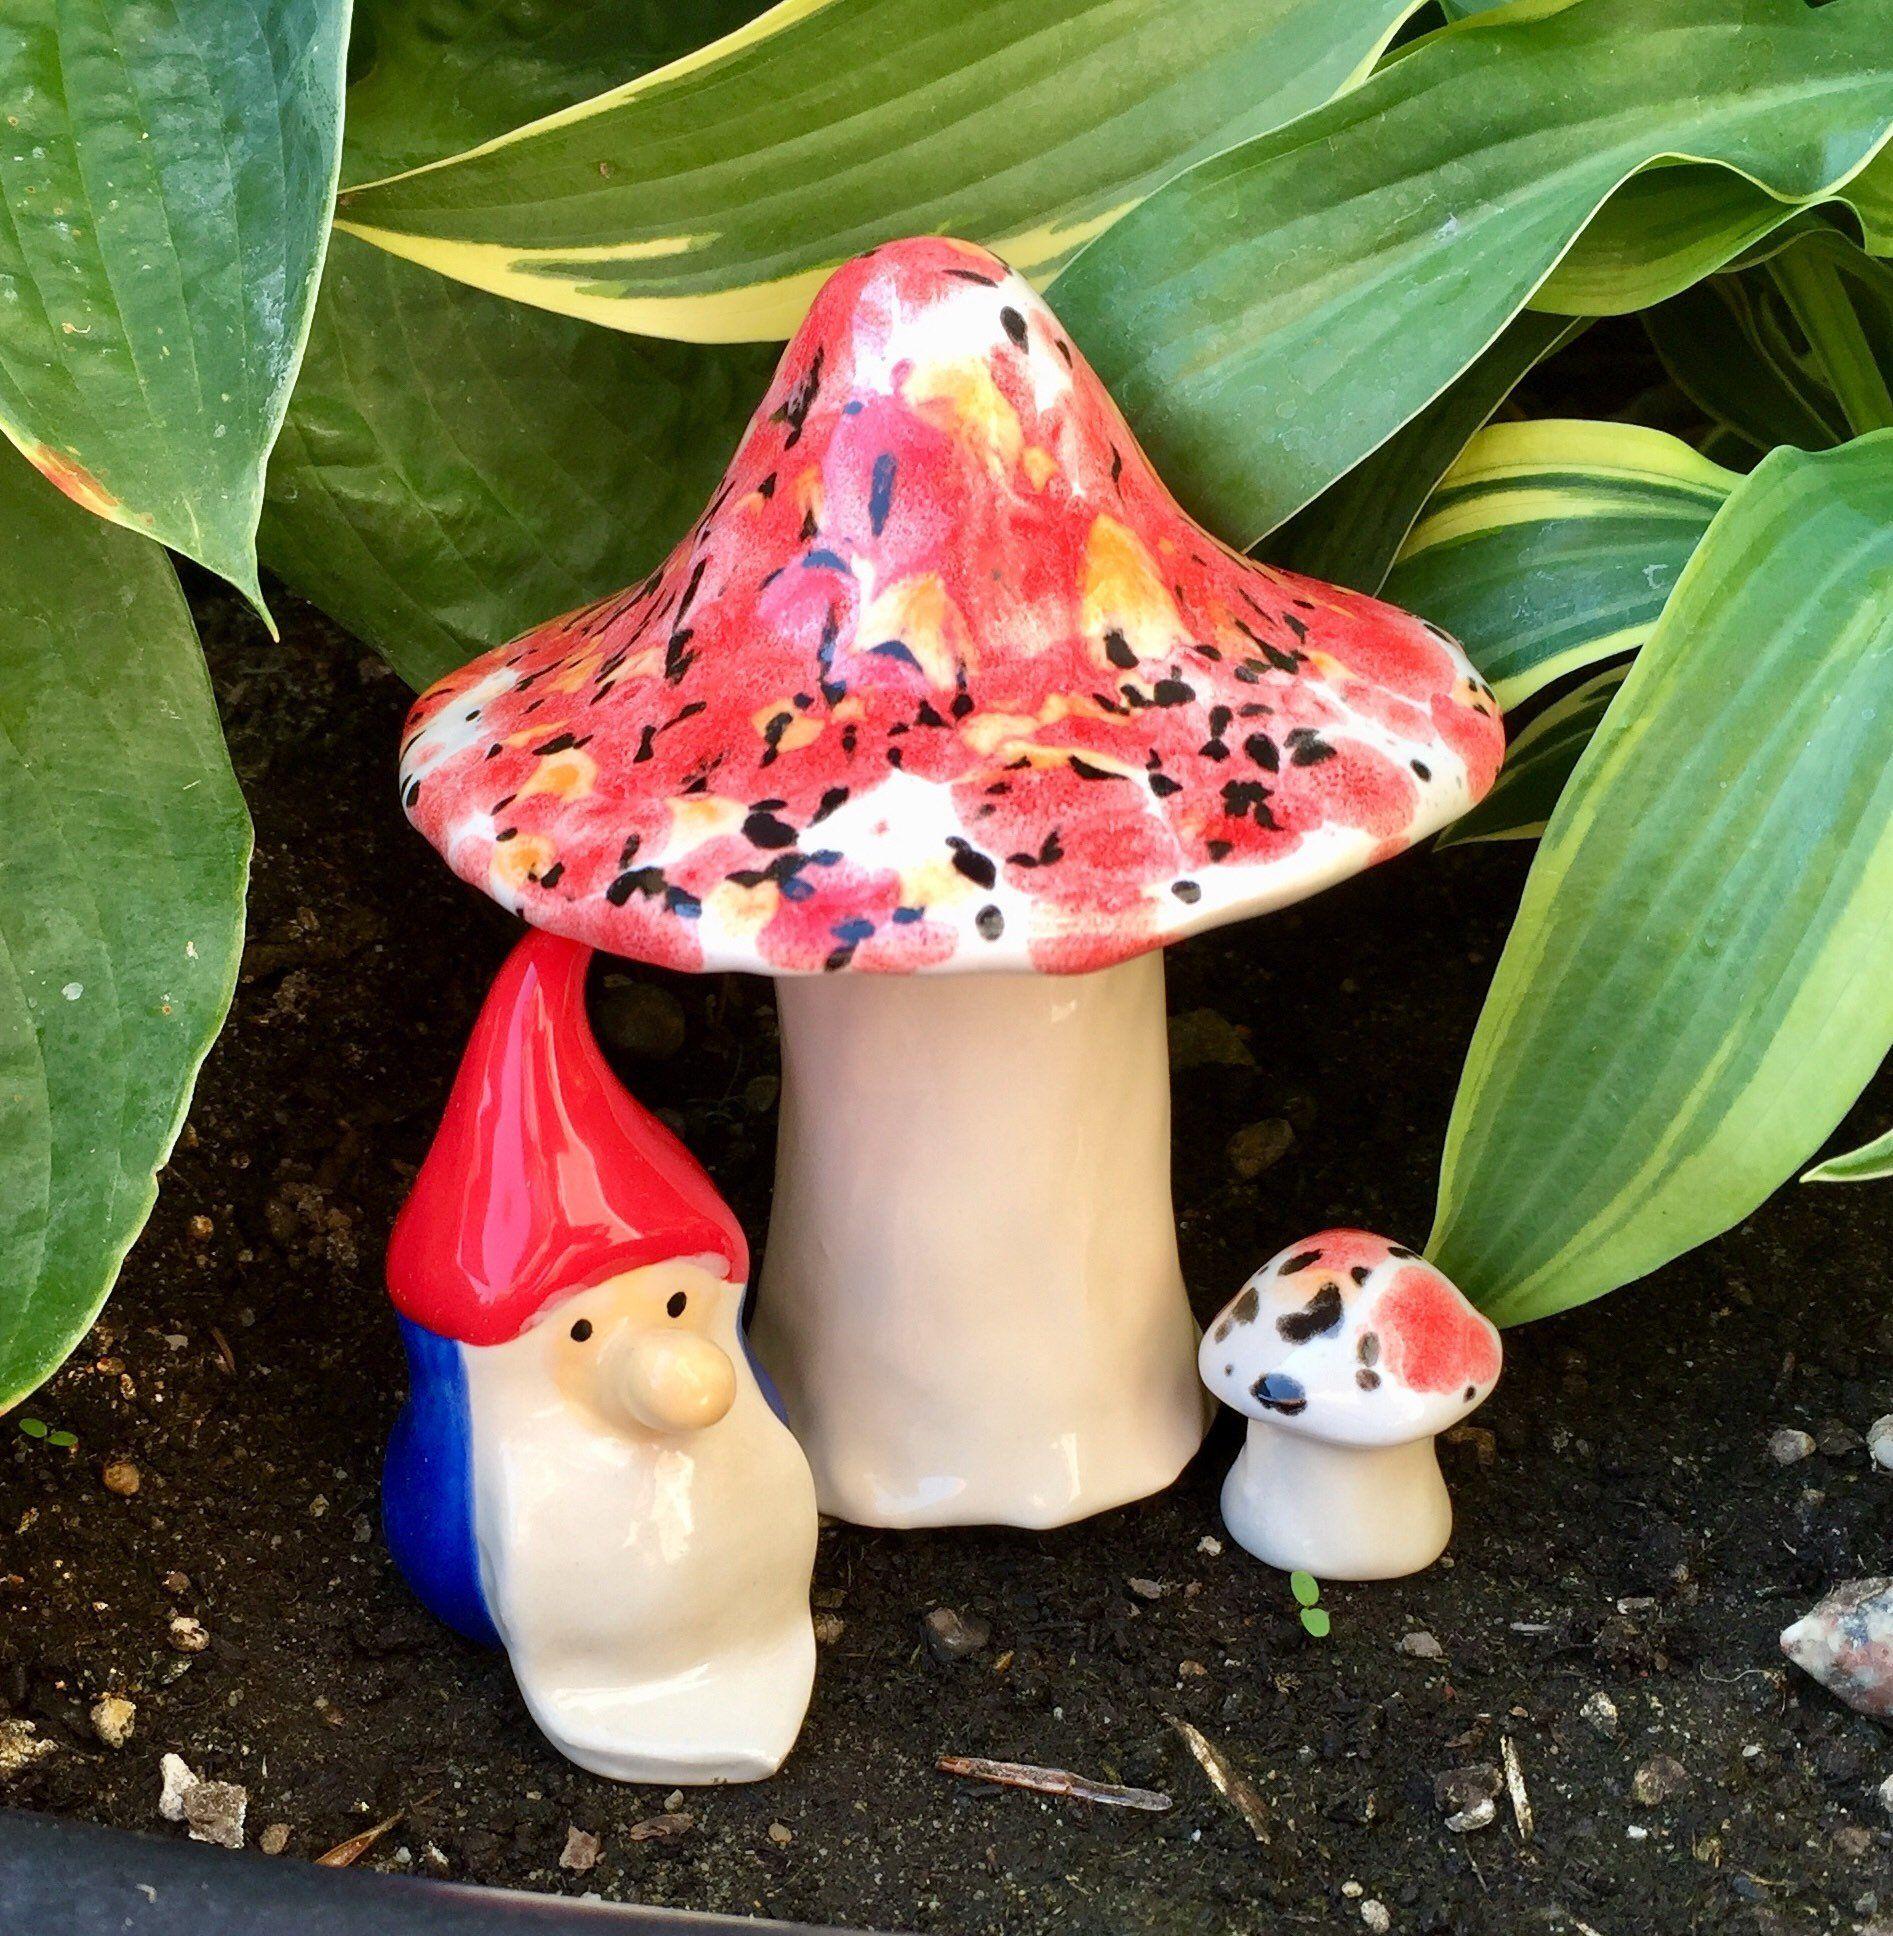 Garden Ceramic Toadstool planter ornament PLANT POT OR BORDER ORNAMENT